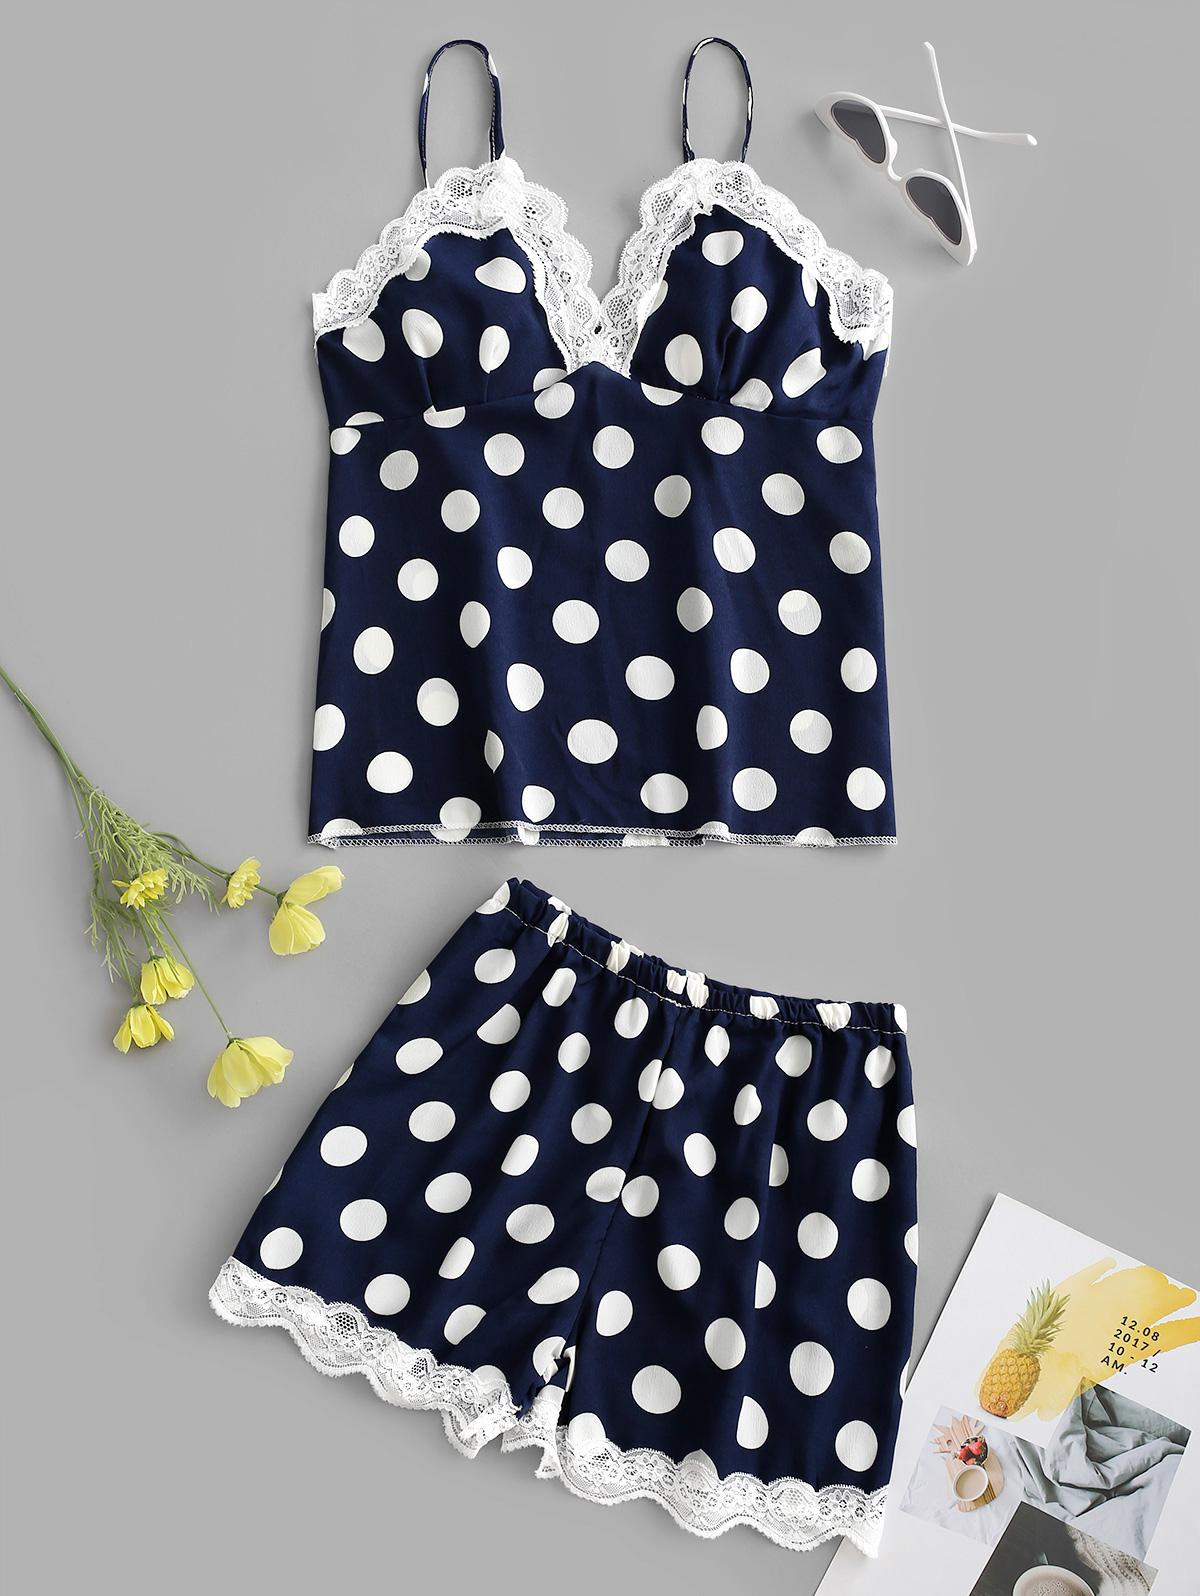 Lace Insert Polka Dot Padded Pajama Shorts Set